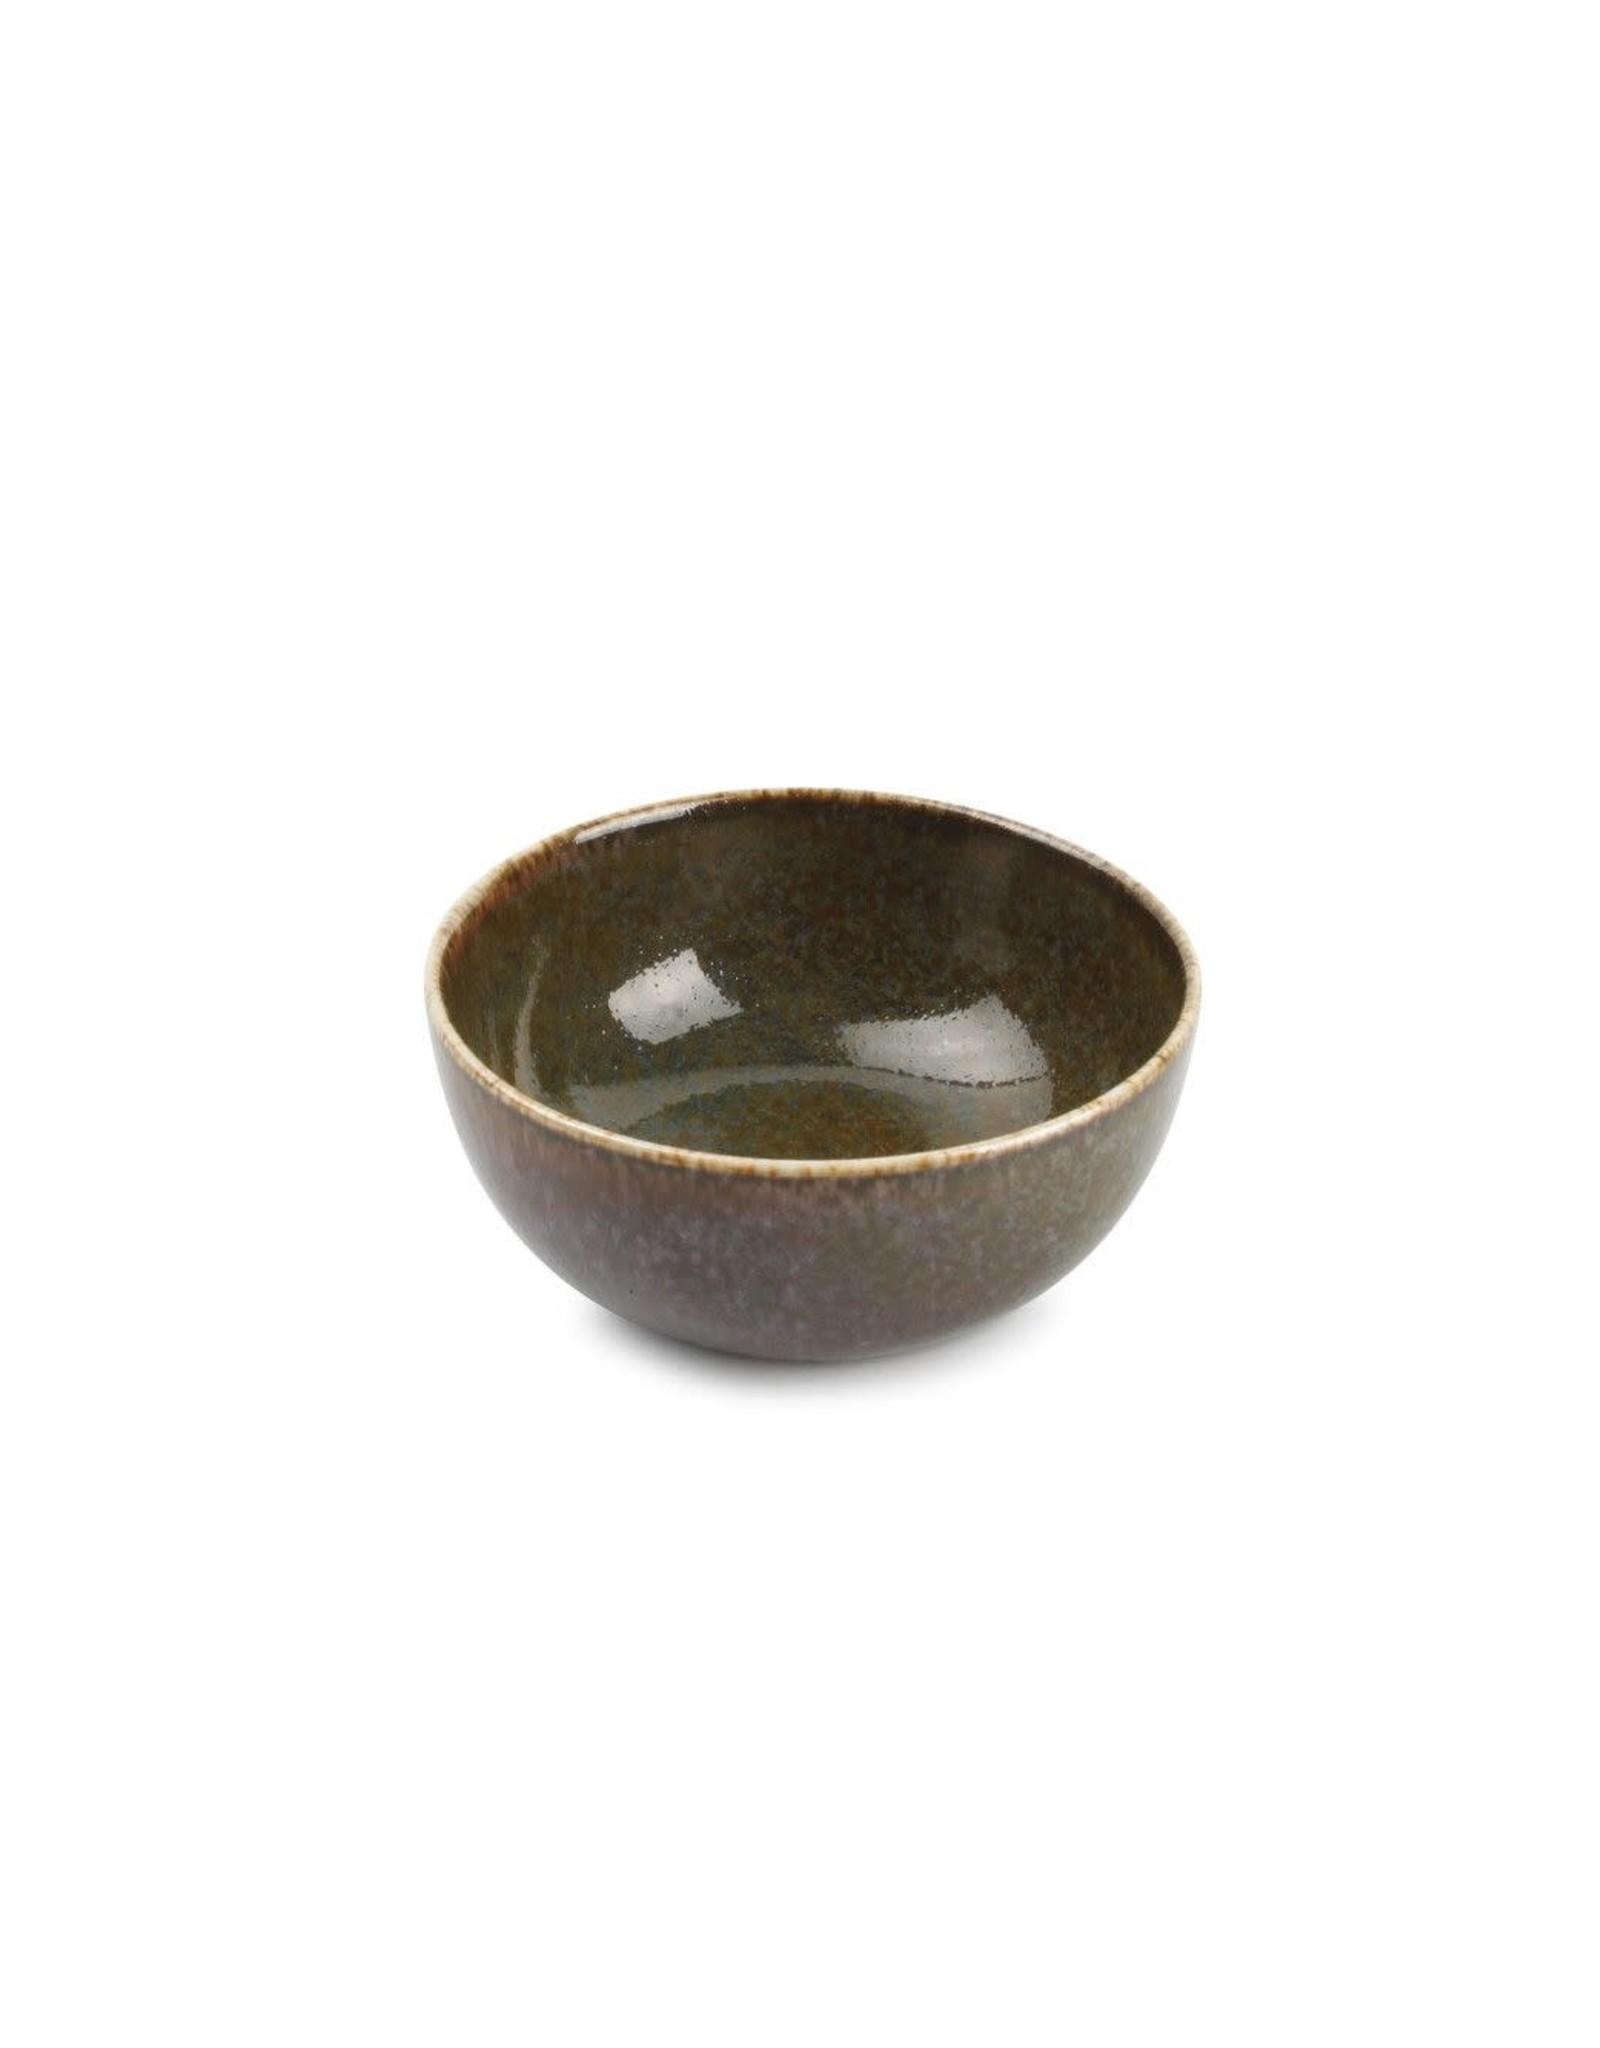 Kommetje Ø10 cm - Green Ombre Glaze